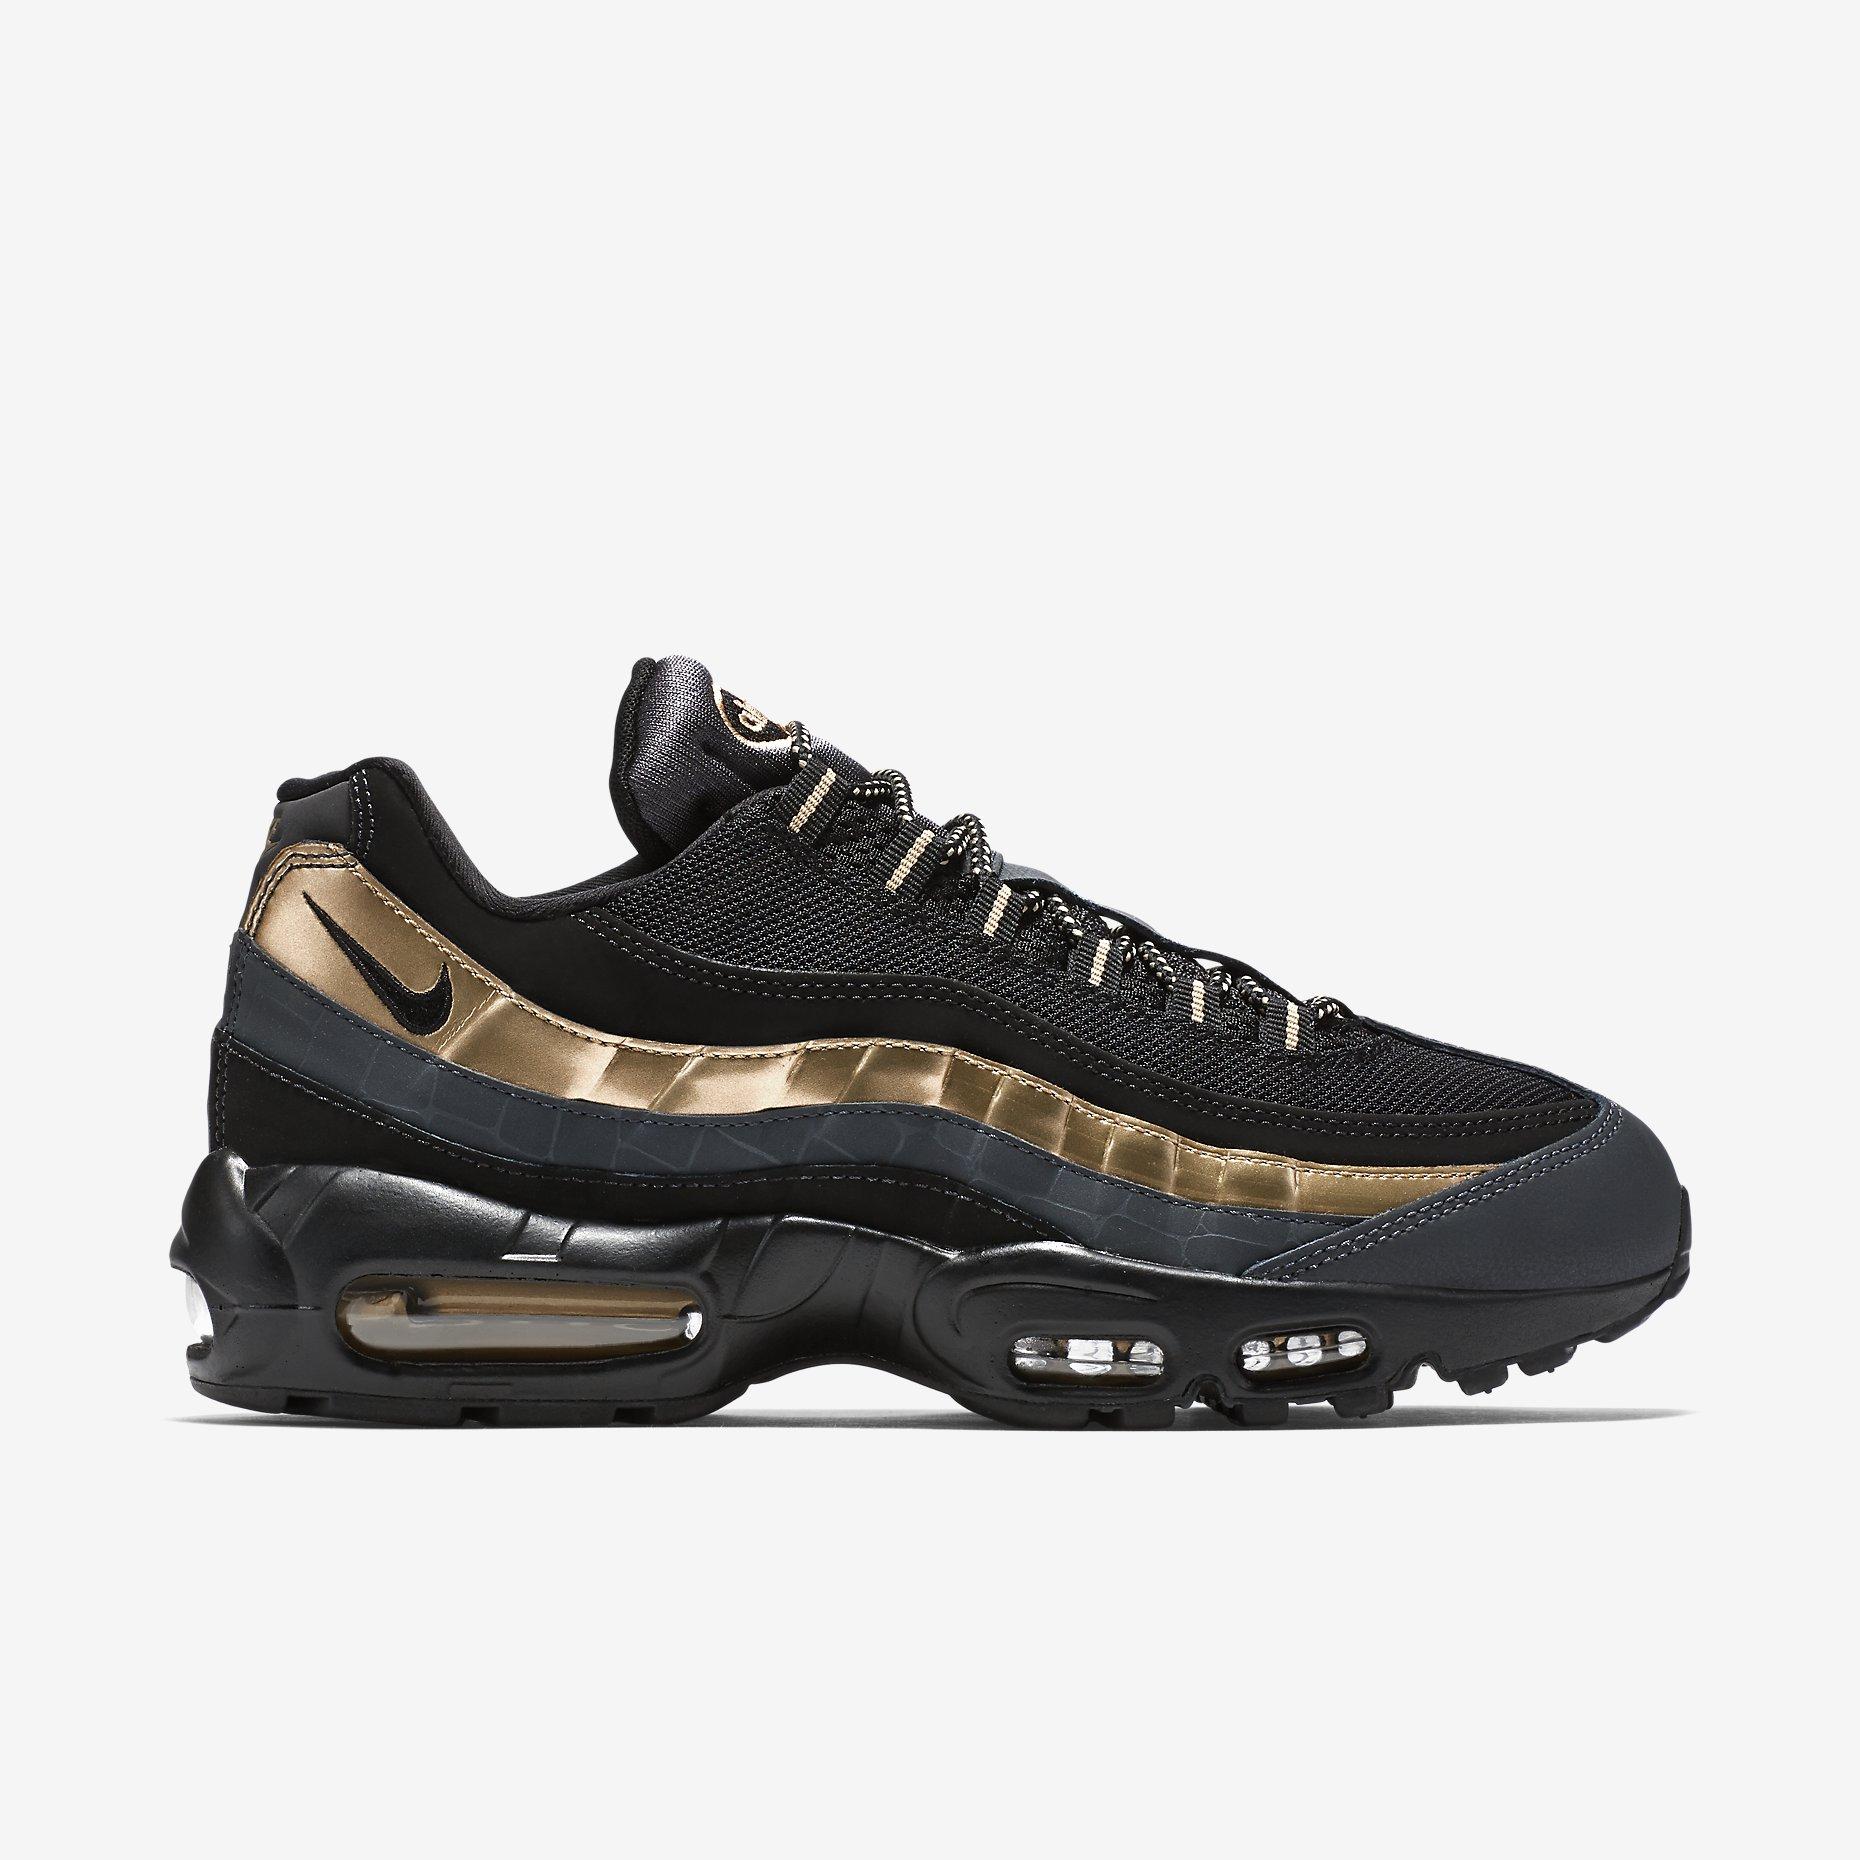 538416-007-air-max-95-bronze7